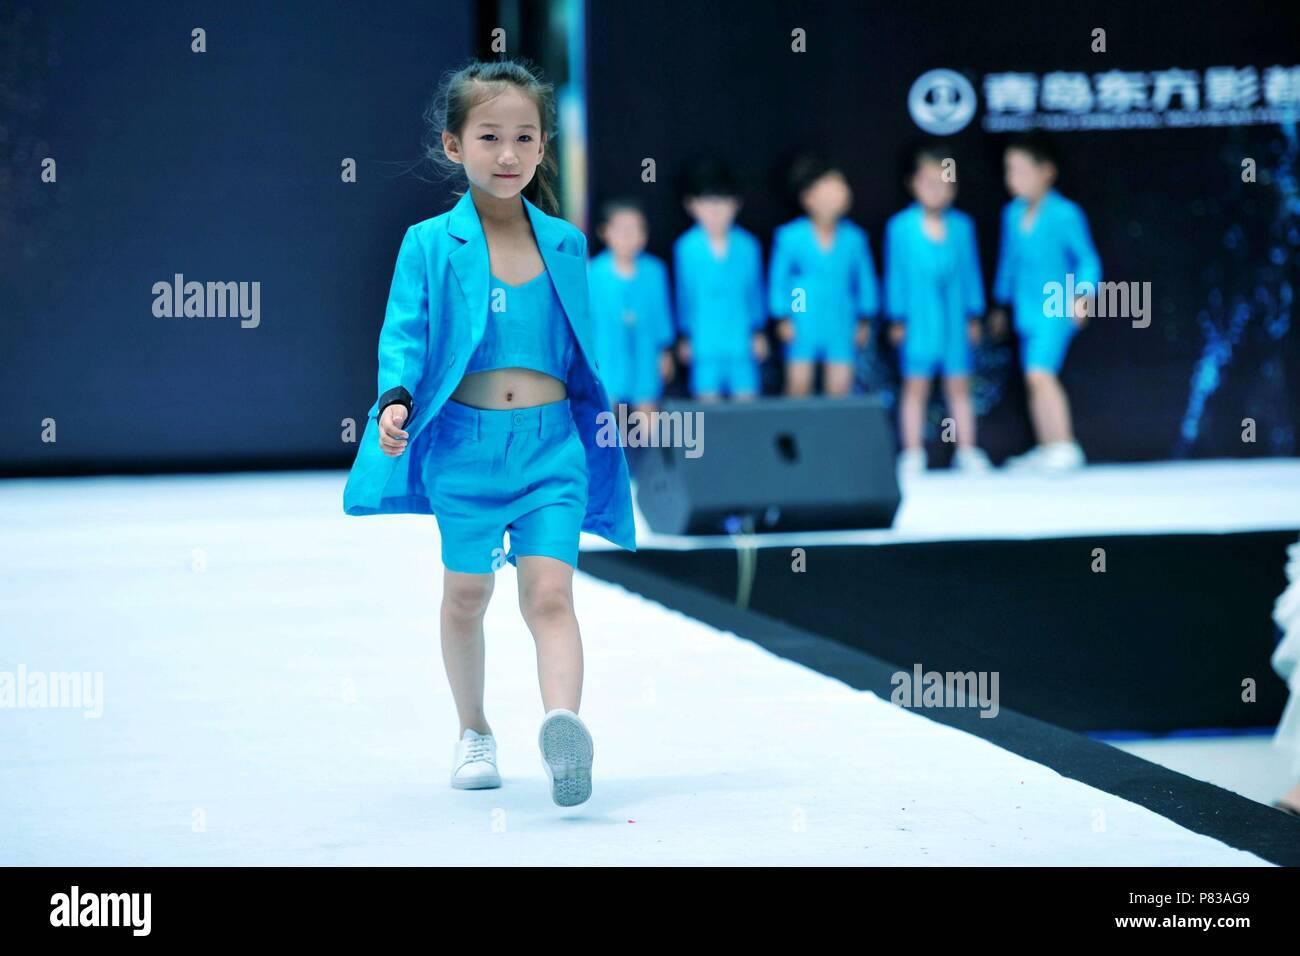 Qingdao, Qingdao, China. 9th July, 2018. Qingdao, CHINA-A kids' fashion show is held in Qingdao, east China's Shandong Province. Credit: SIPA Asia/ZUMA Wire/Alamy Live News - Stock Image